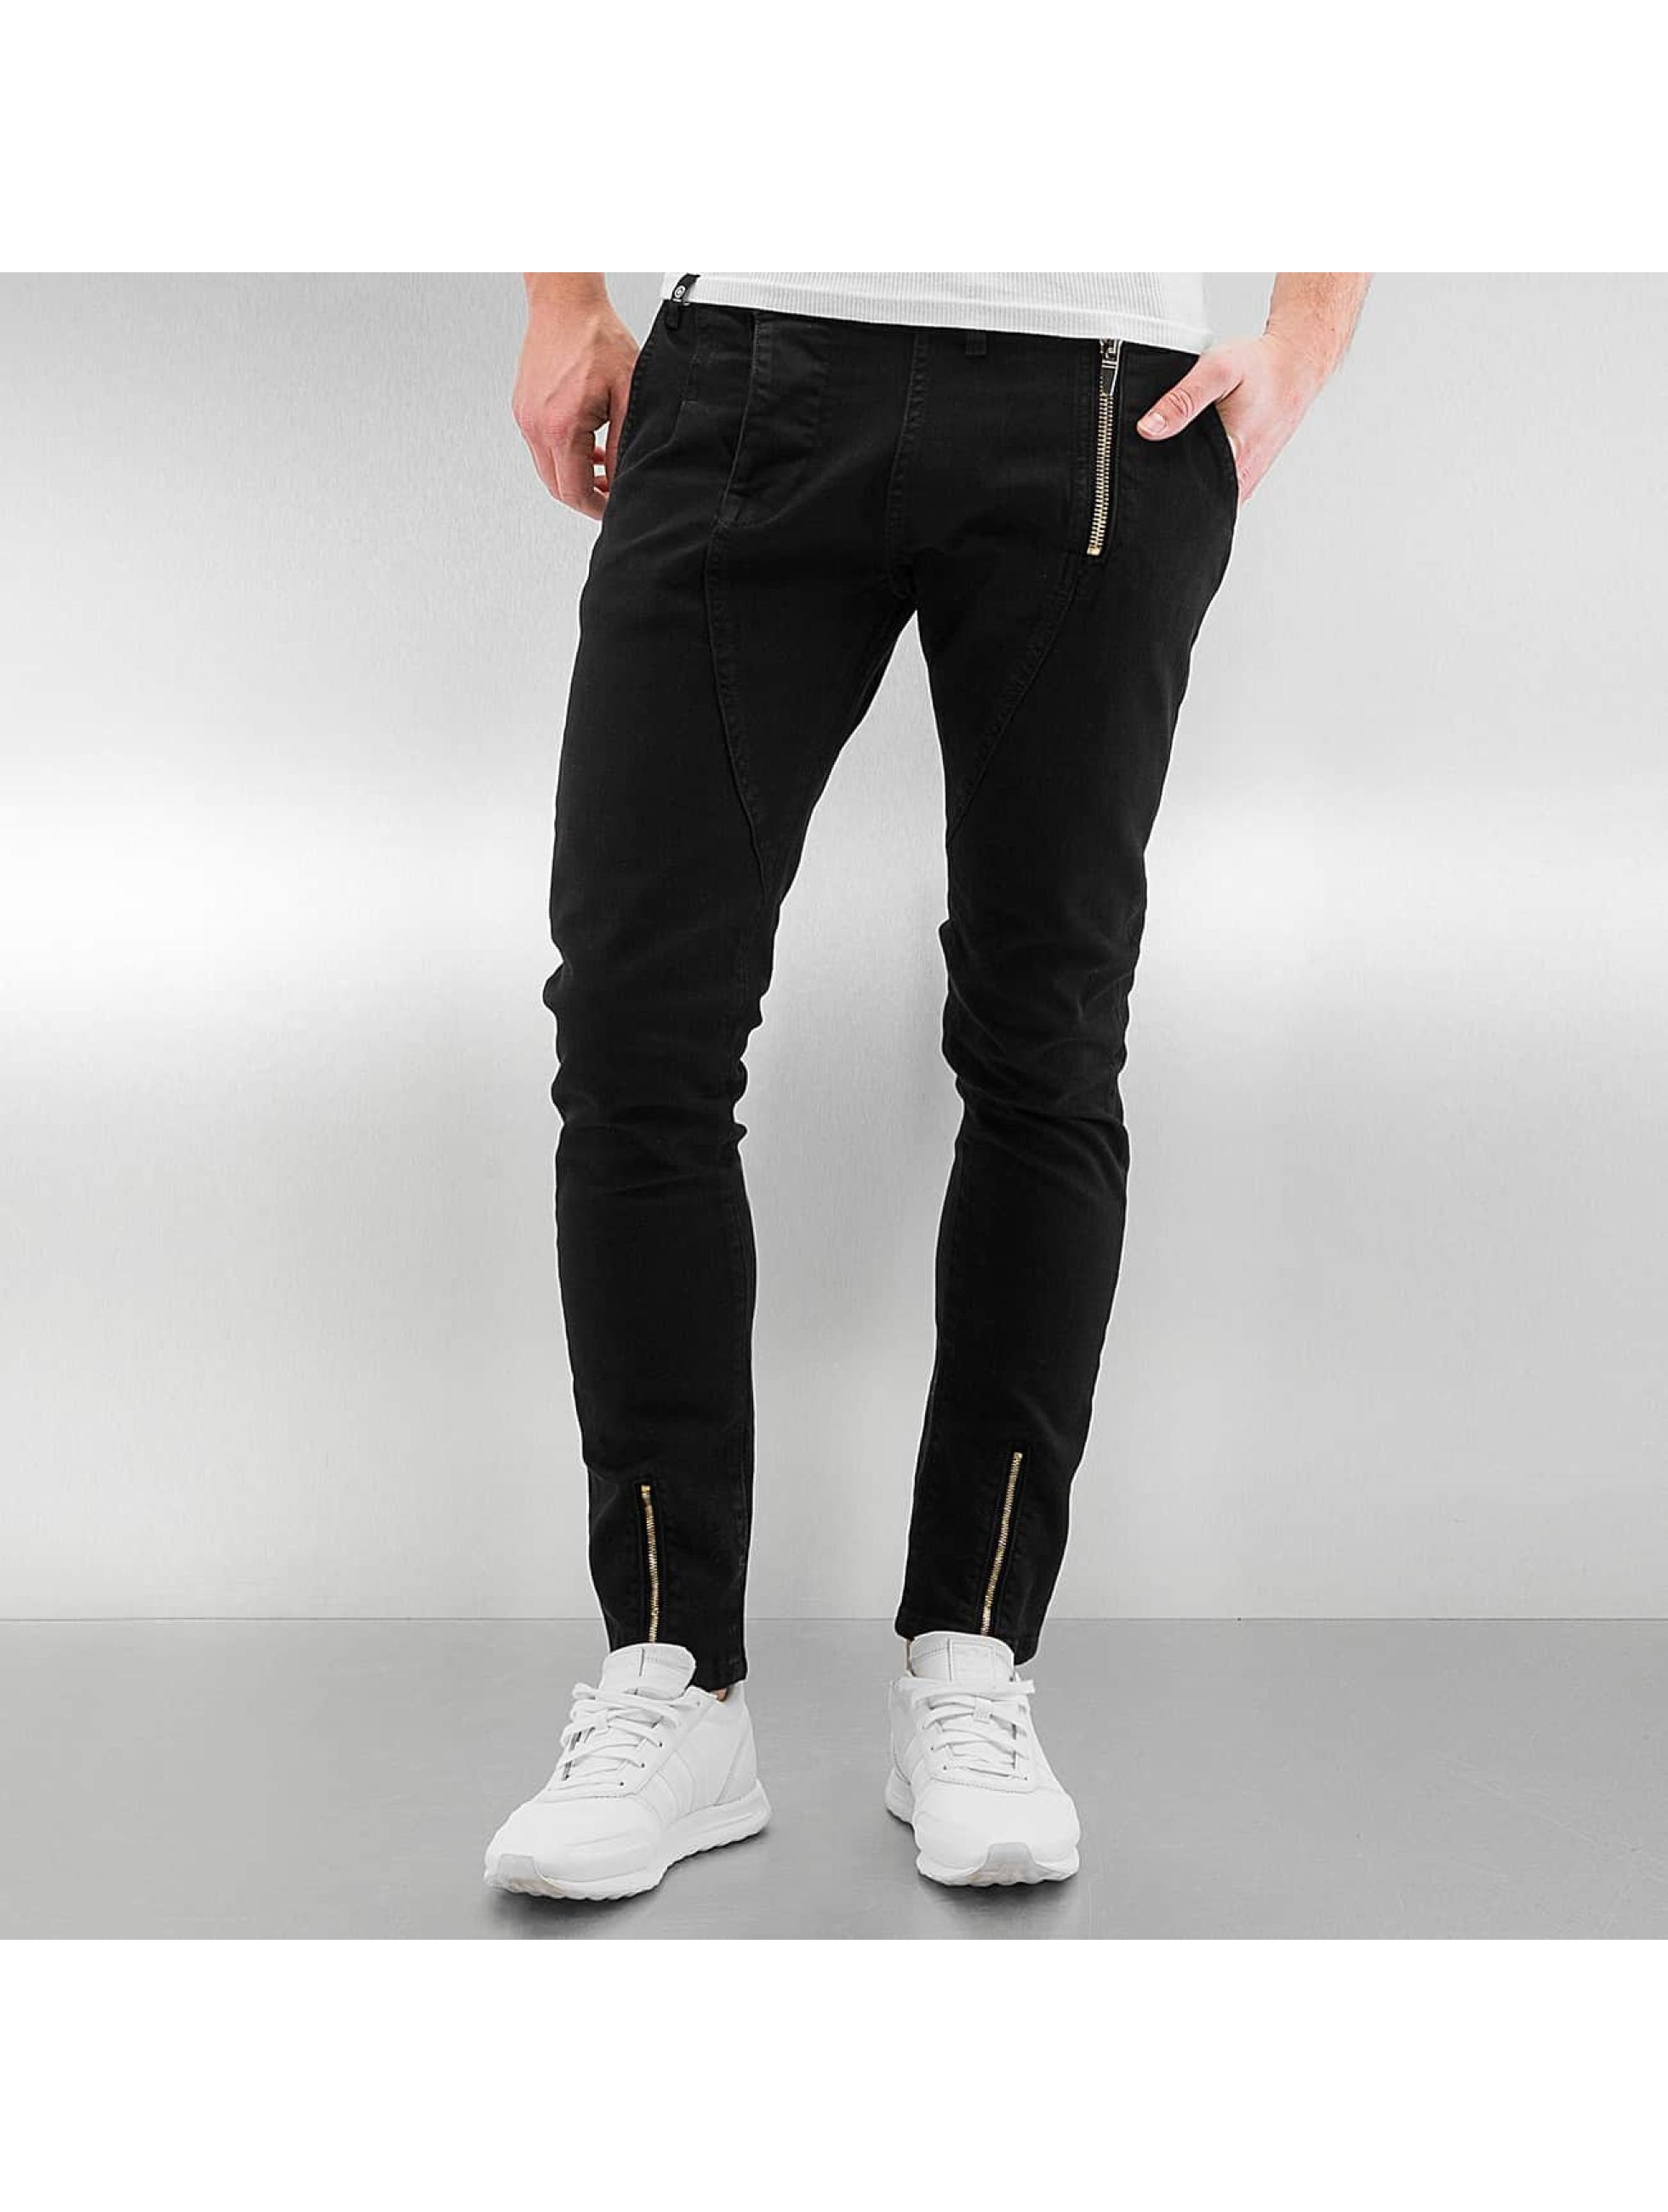 2Y / Skinny Jeans Bolton in black W 33